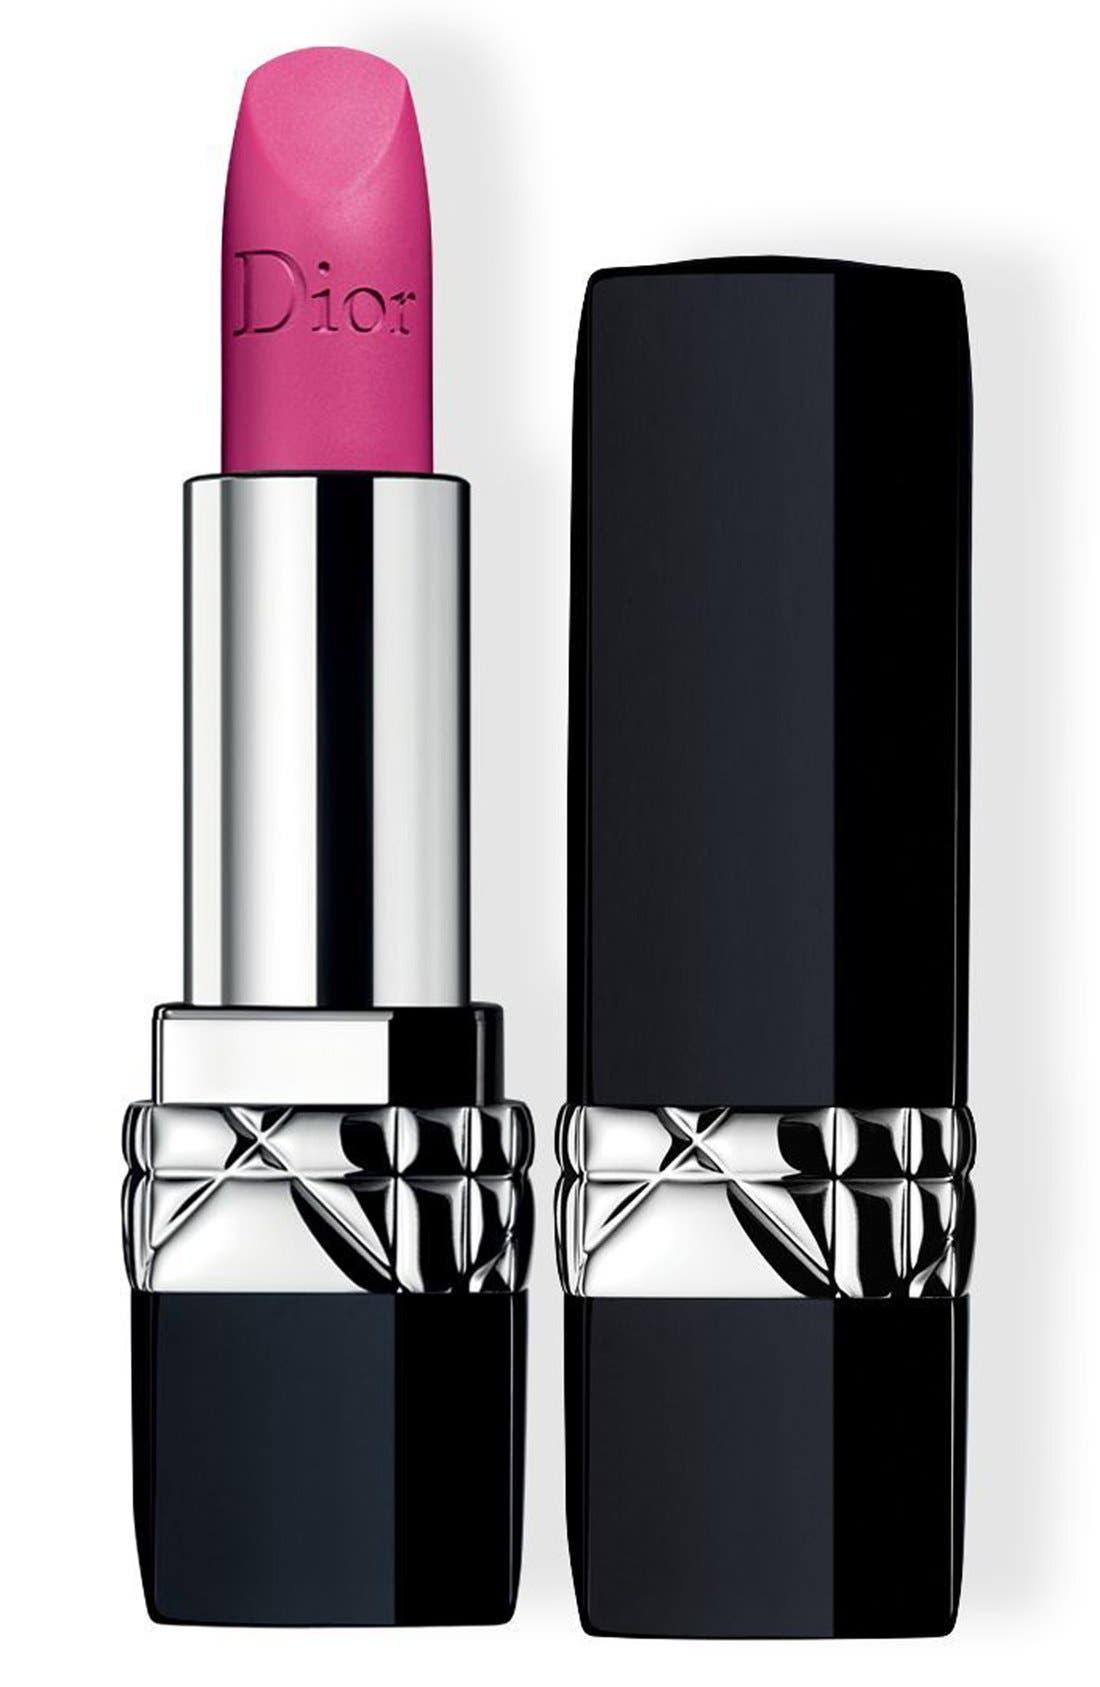 Dior Couture Color Rouge Dior Lipstick - 787 Exuberant Matte